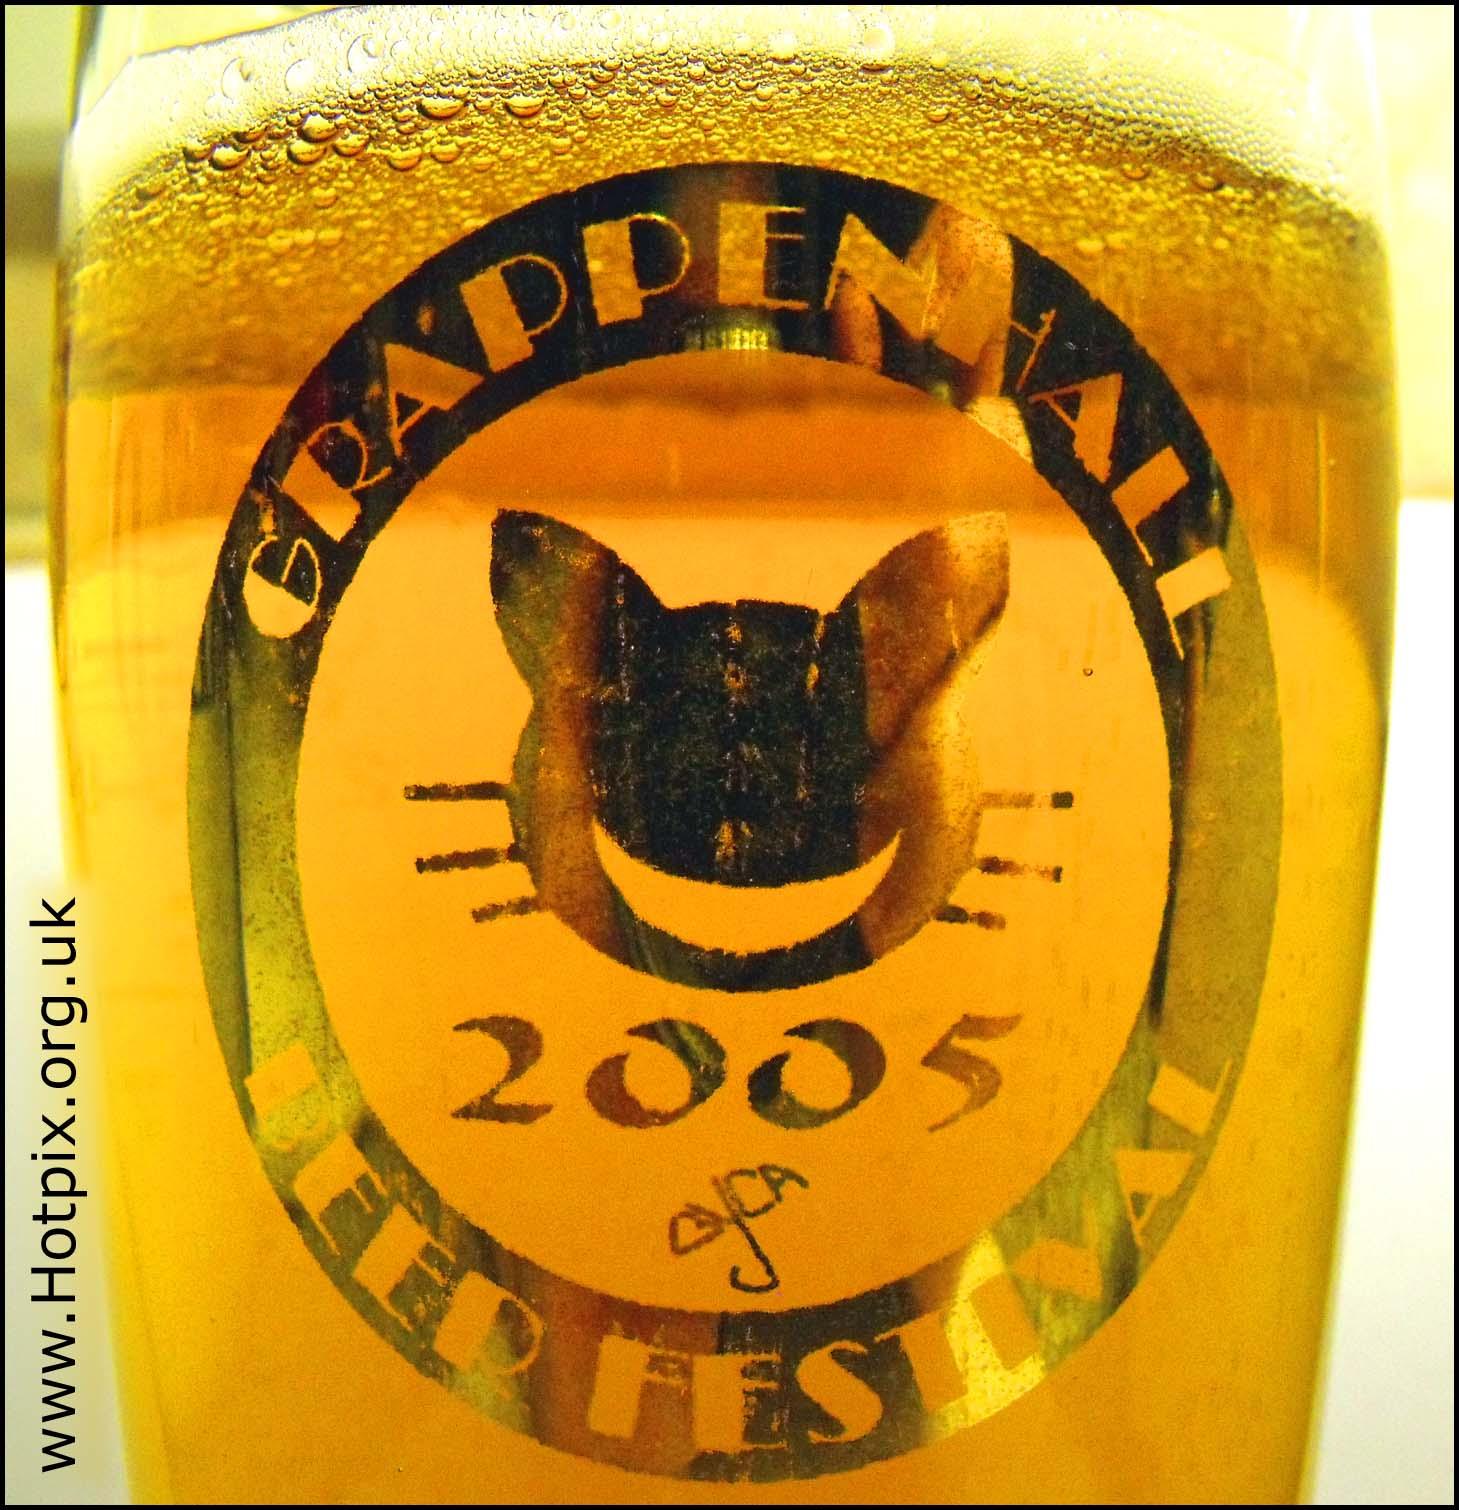 ginger,beer,alcoholic,crabbies,charing,cross,x,charingx,glasgow,clyde,scotland,grappenhall,warrington,cheshire,england,UK,GB,glass,gold,golden,ale,bubbles,logo,festival,GYCA,bellhouse,club,lane,cat,cheshire cat,hotpix,hotpixuk,tony,smith,this photo rocks,Hotpicks,hotpics,hot,pics,pix,picks,hotpix.freeserve.co.uk,edinbrugh